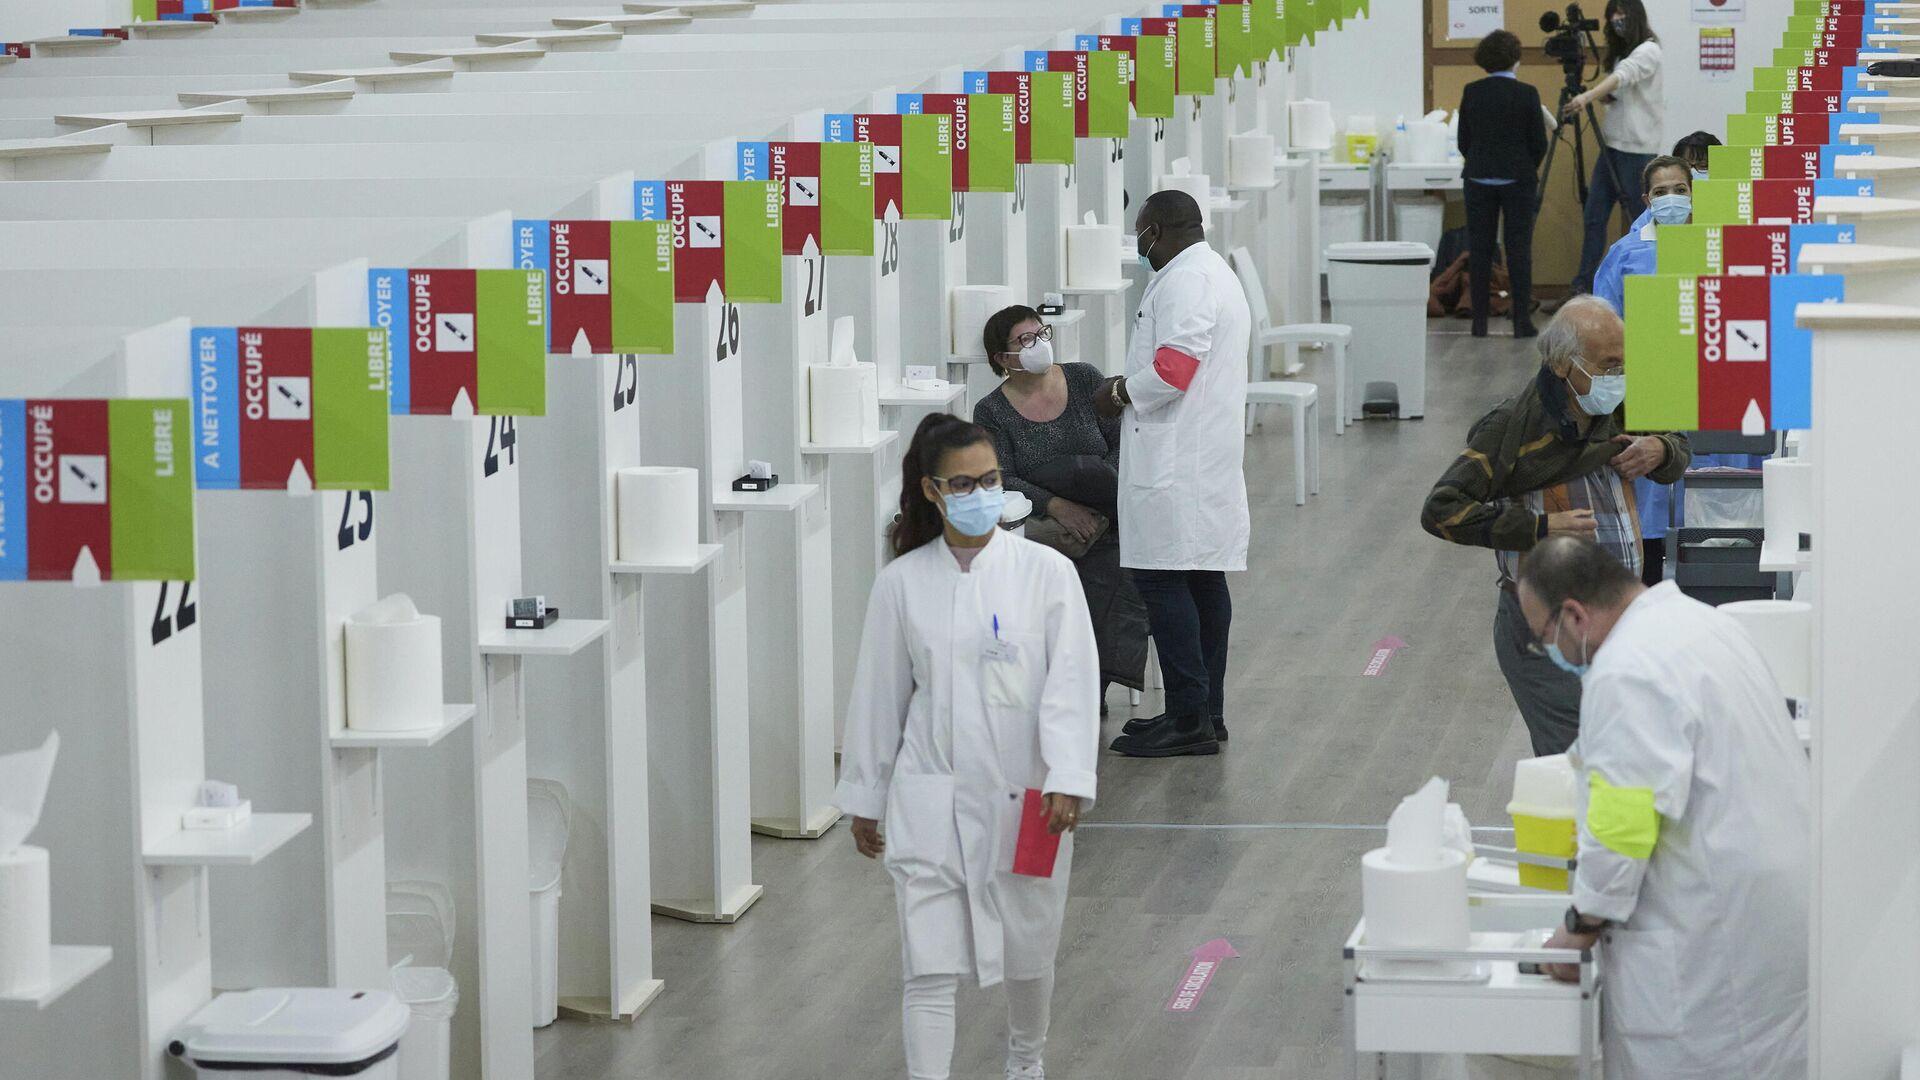 Impfzentrum in Genf, 3. Februar 2021 - SNA, 1920, 26.02.2021